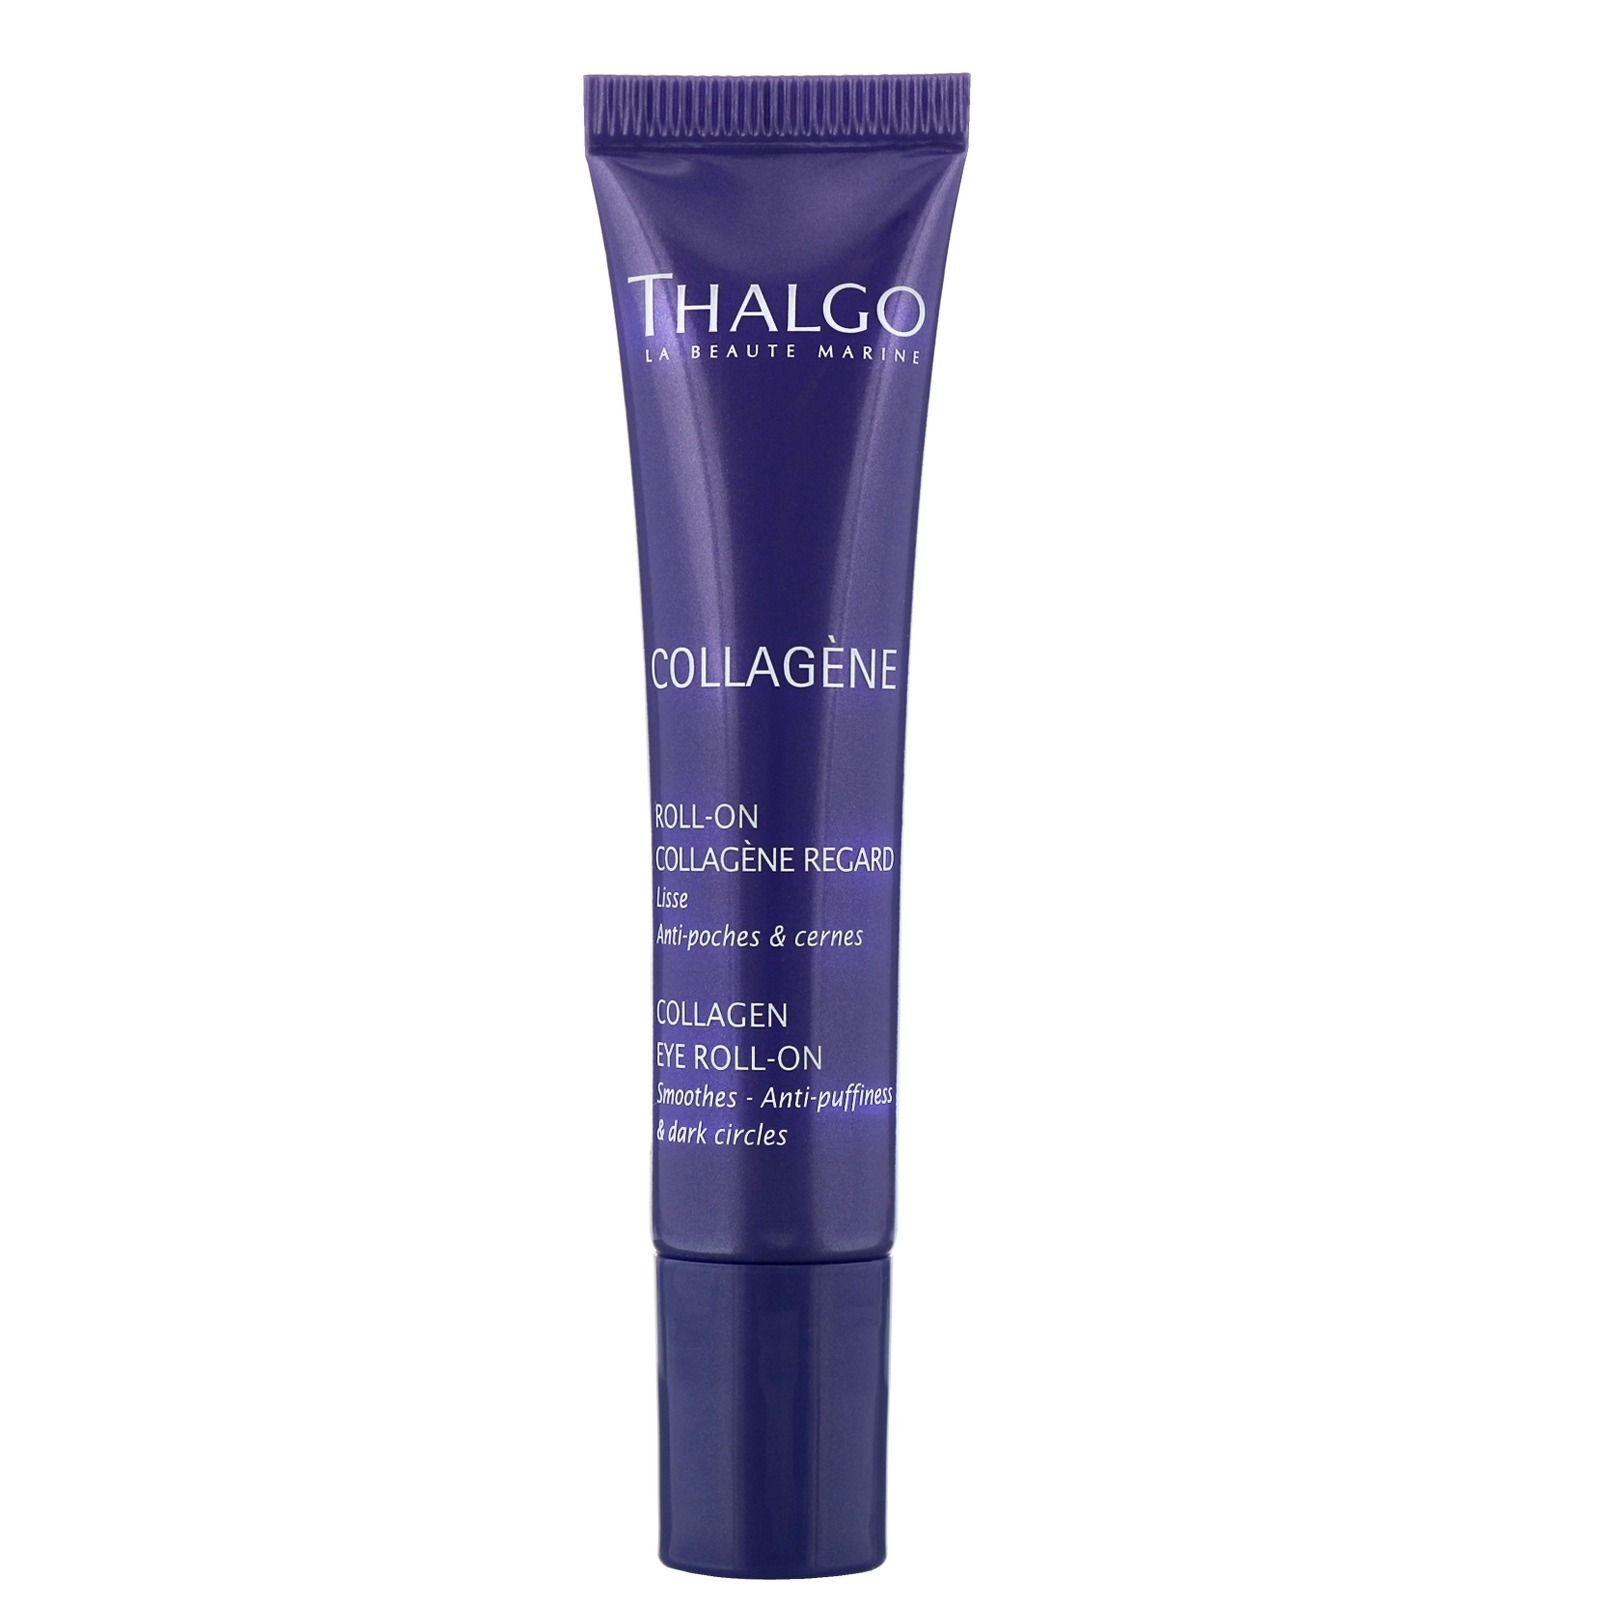 Thalgo - Face Collagen Eye Roll-On 15ml for Women